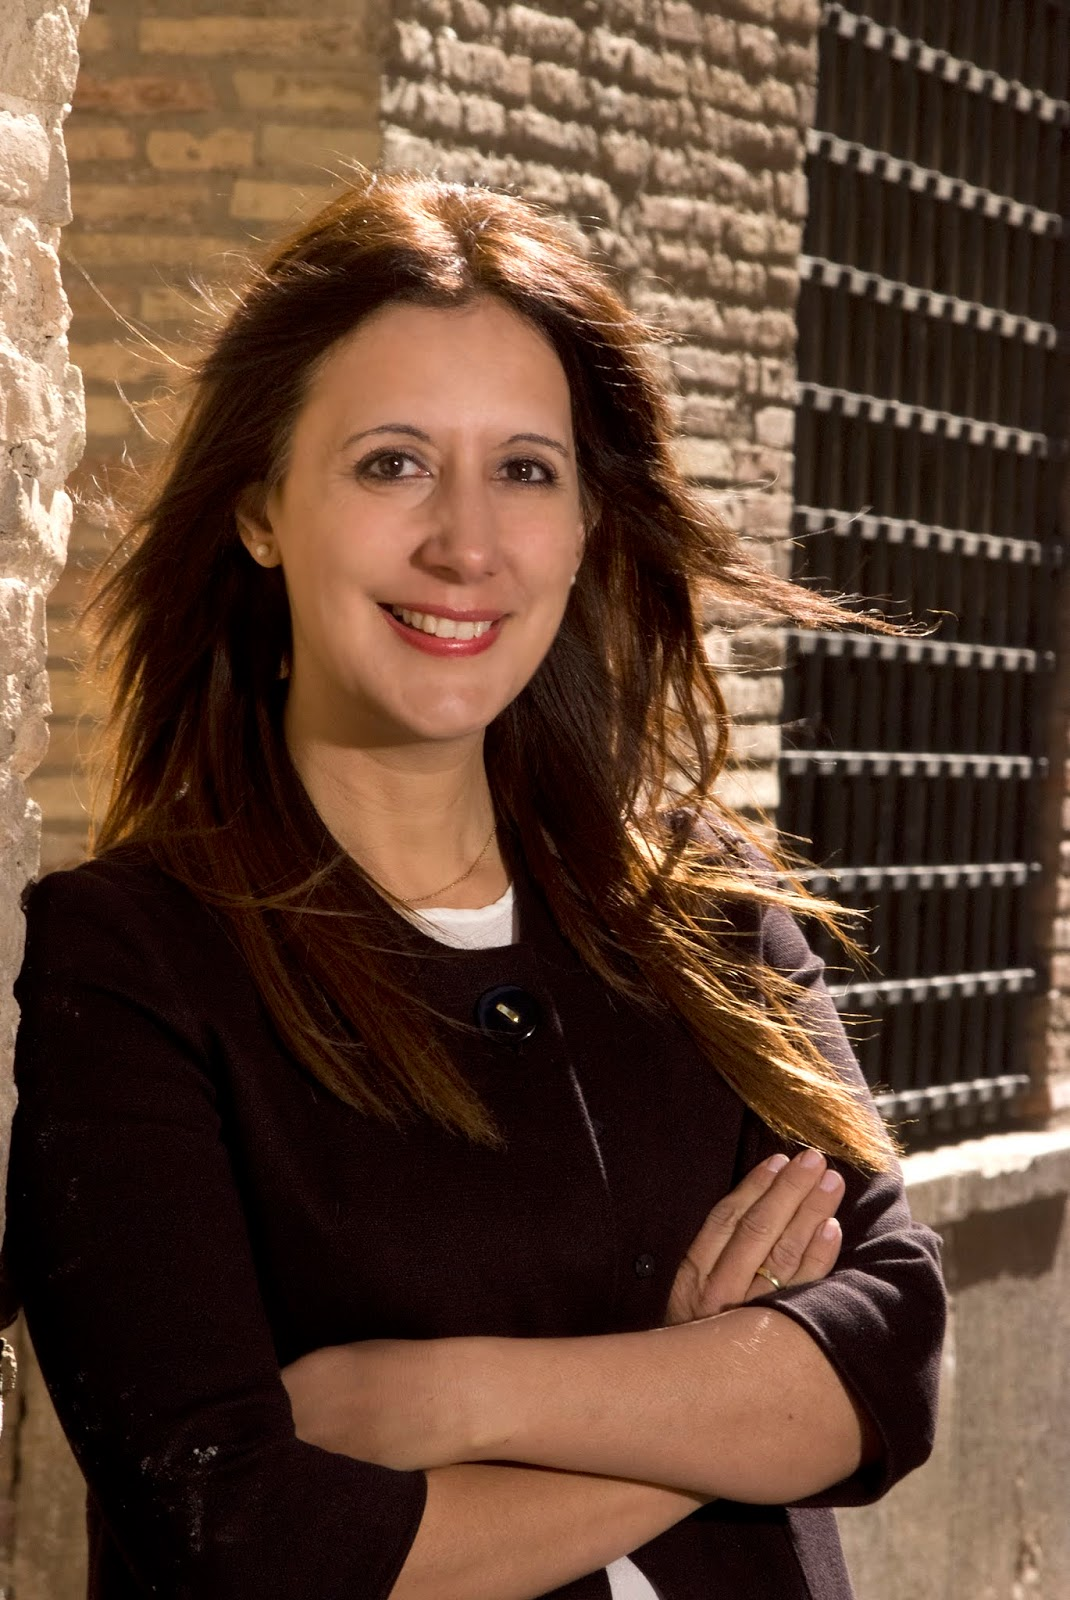 Book Q&As with Deborah Kalb: Q&A with Dolores Redondo